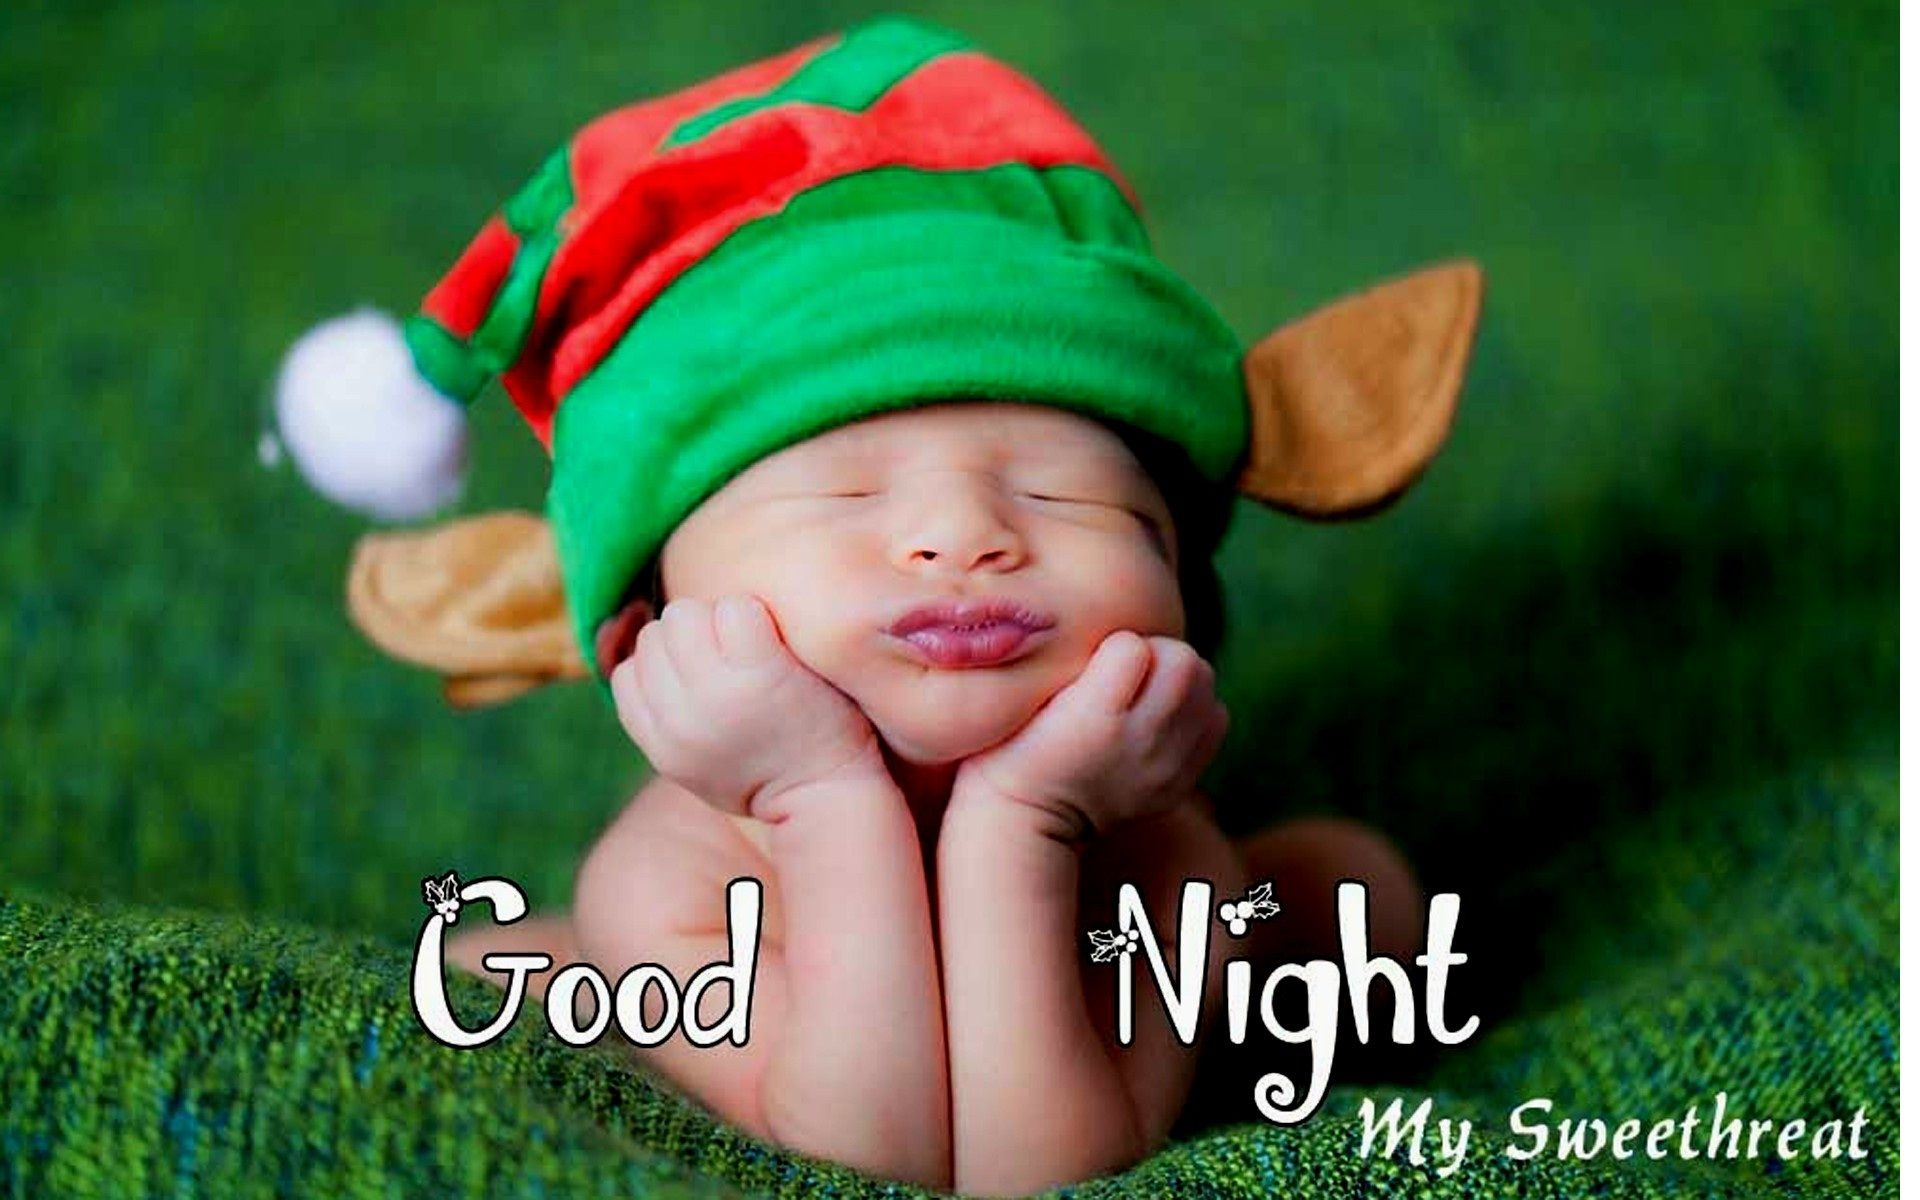 Good Night Sms Jokes For Friends Night Jokes Funny Good Night Images Good Night Messages Romantic Good Night Image